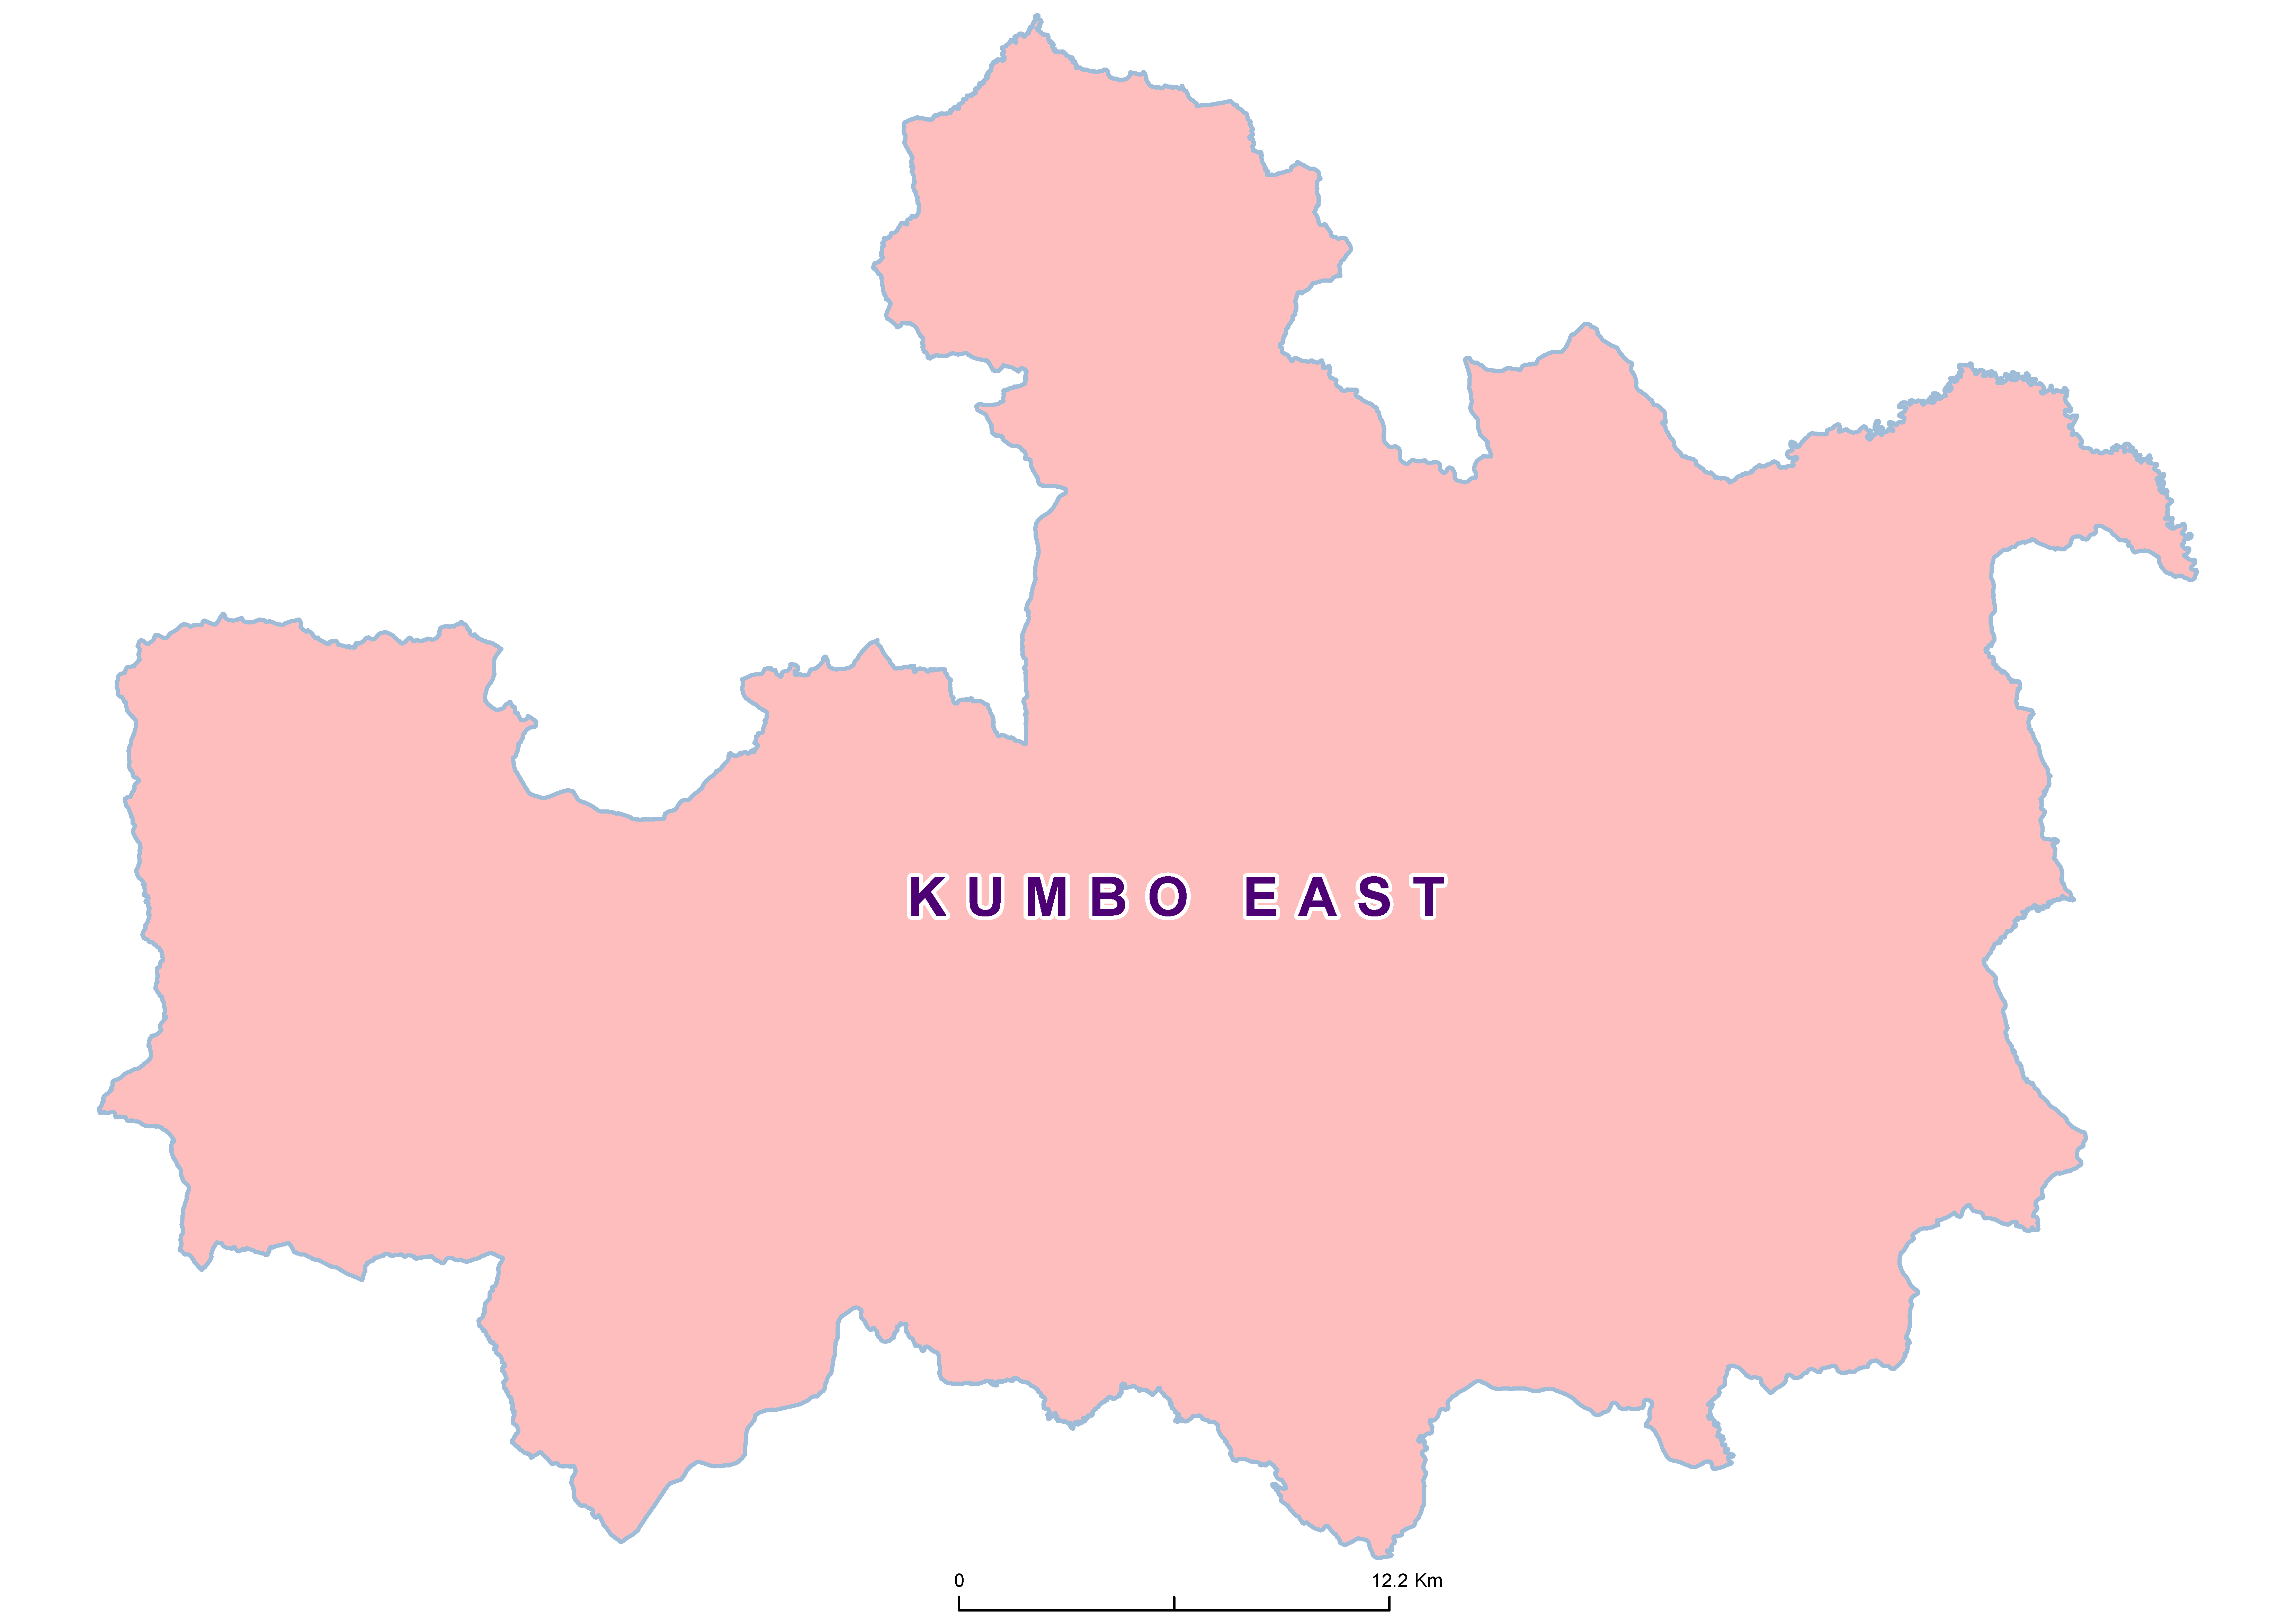 Kumbo east Mean SCH 20180001